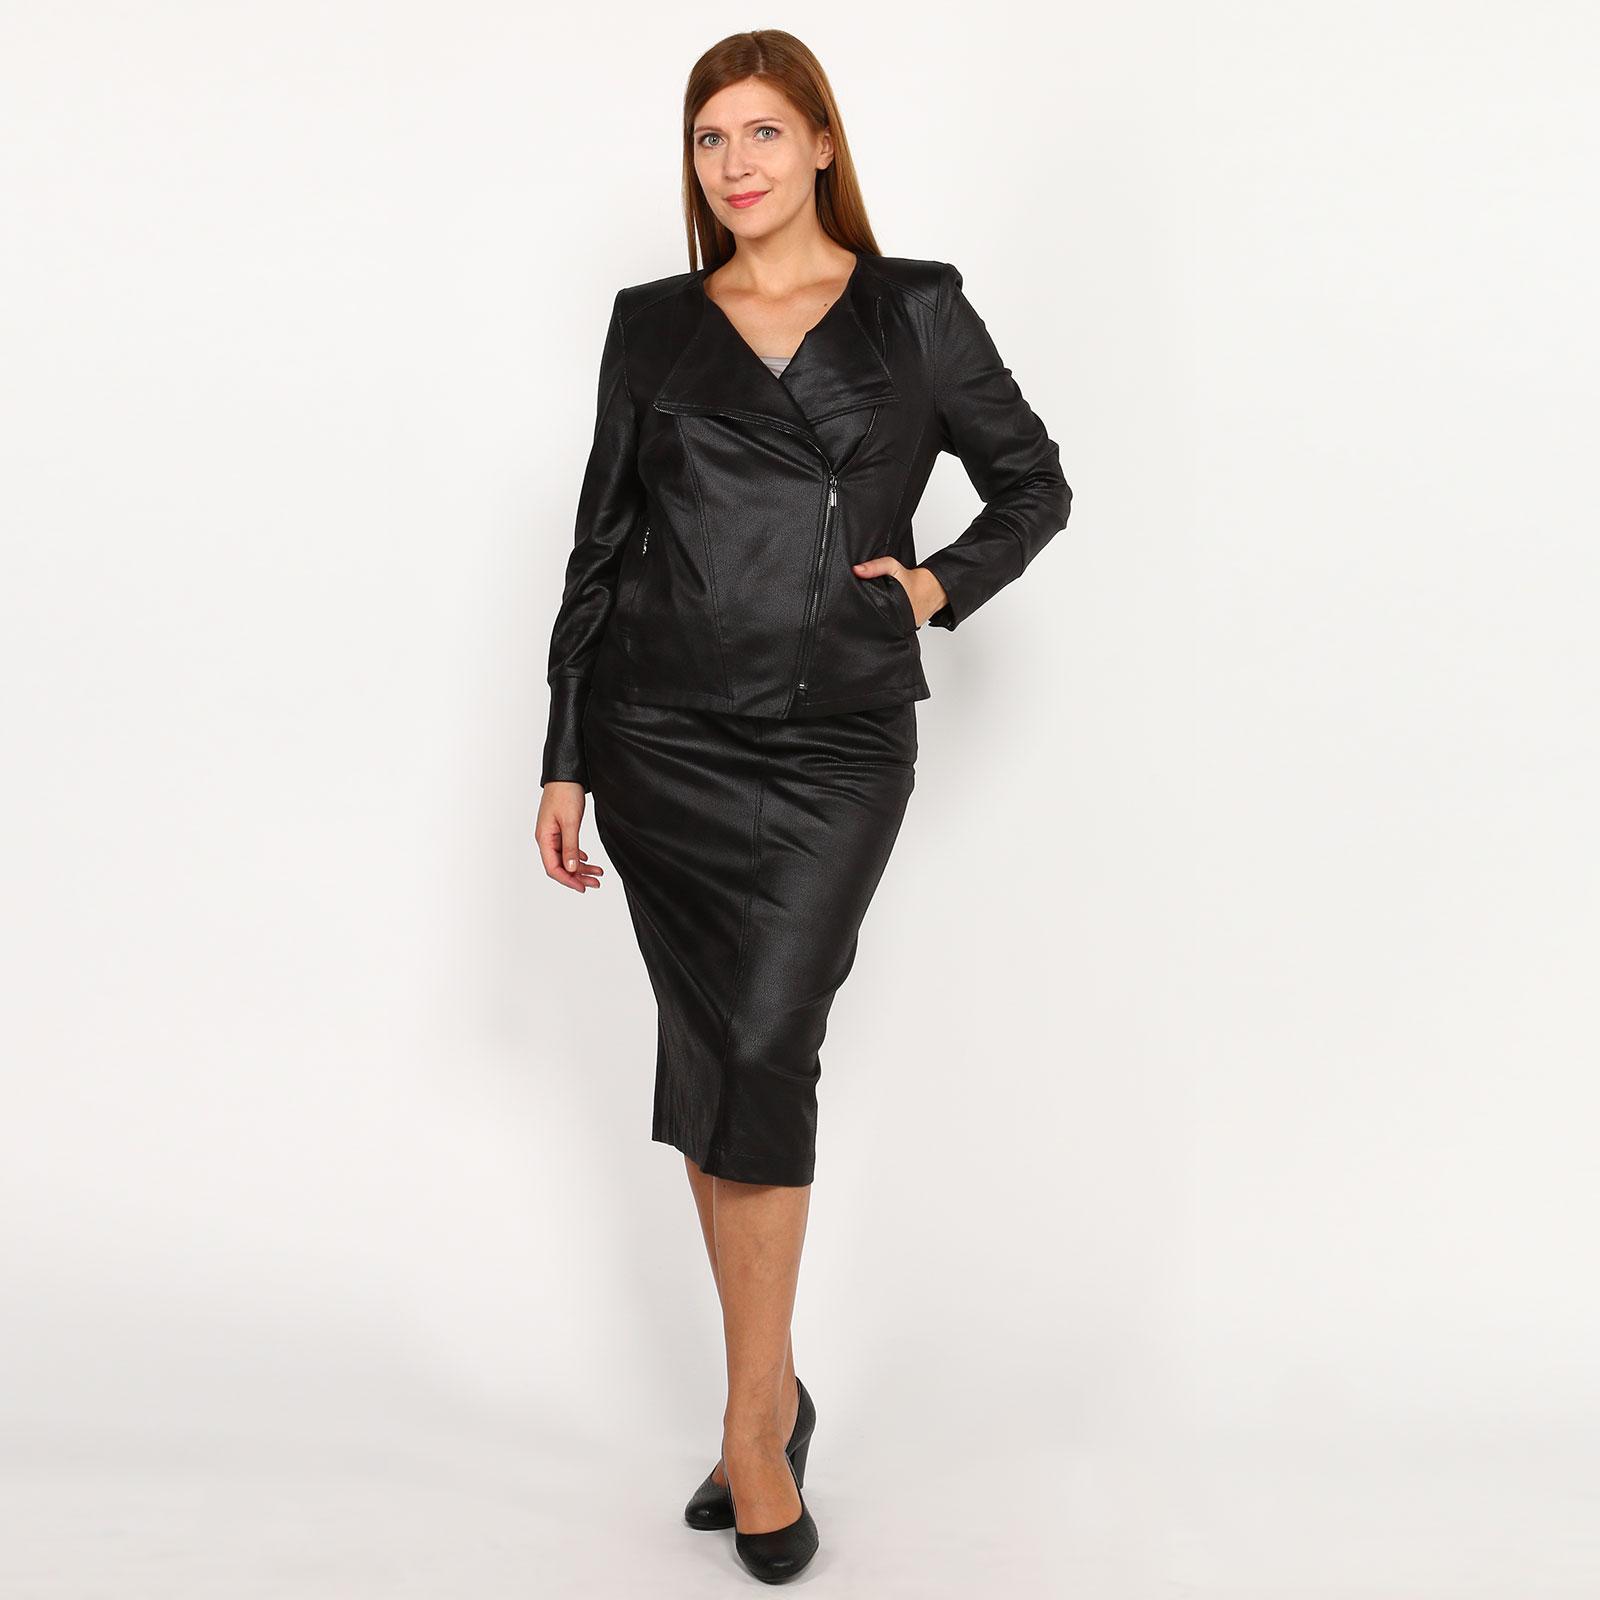 Комплект: куртка-косуха и юбка-карандаш